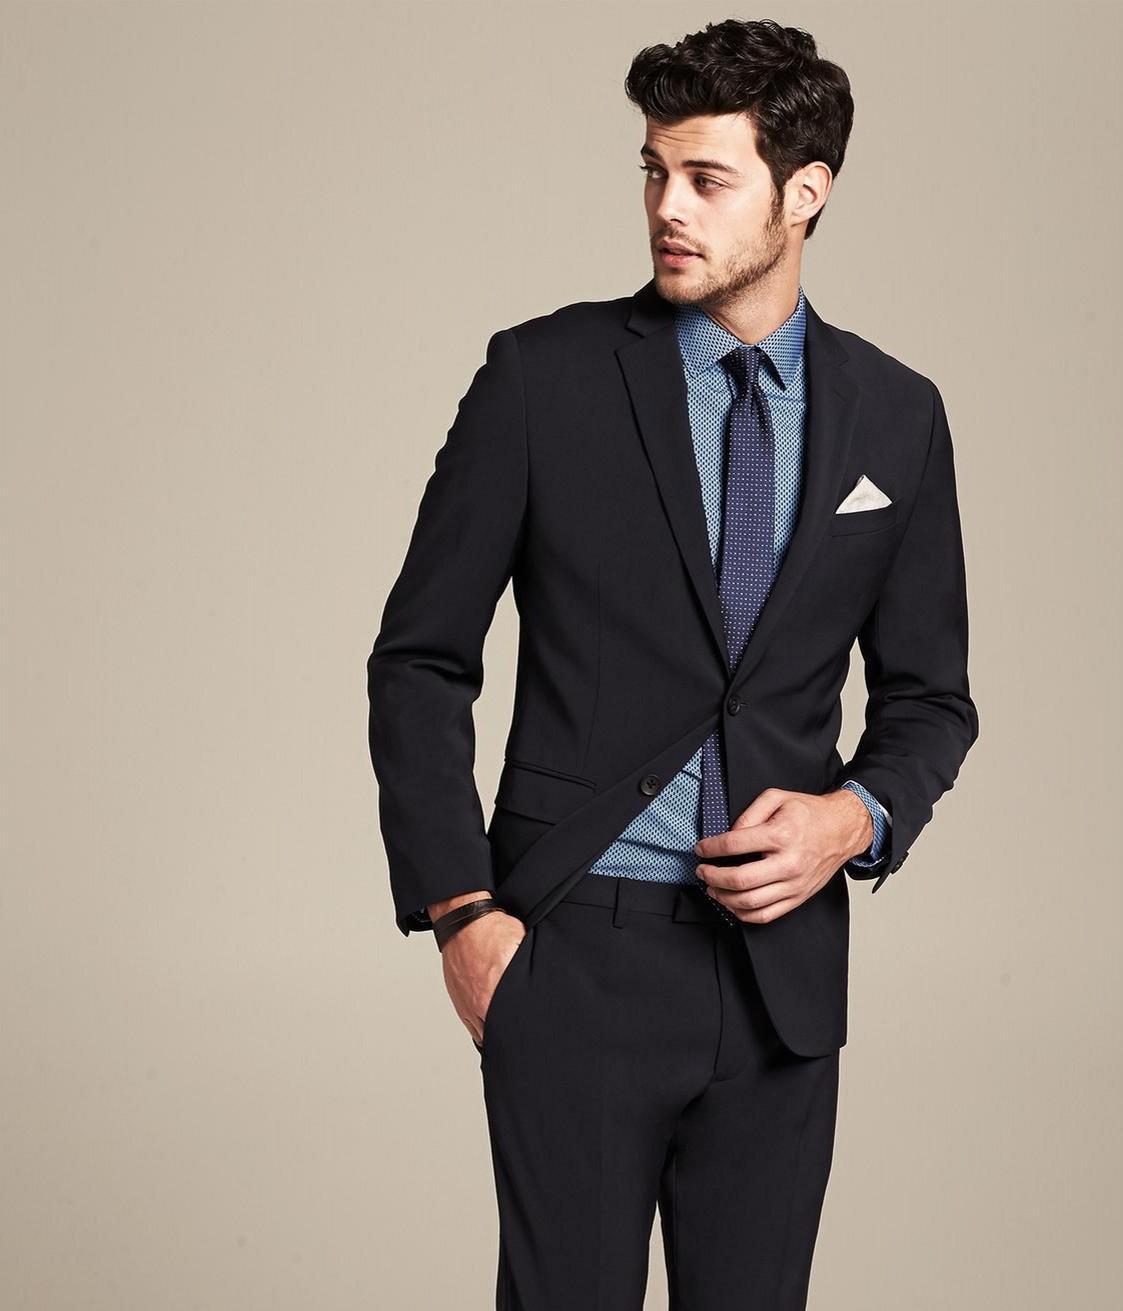 2015 New Arrival Suit Black Man Pants Formal Wear For Men Traje De ...